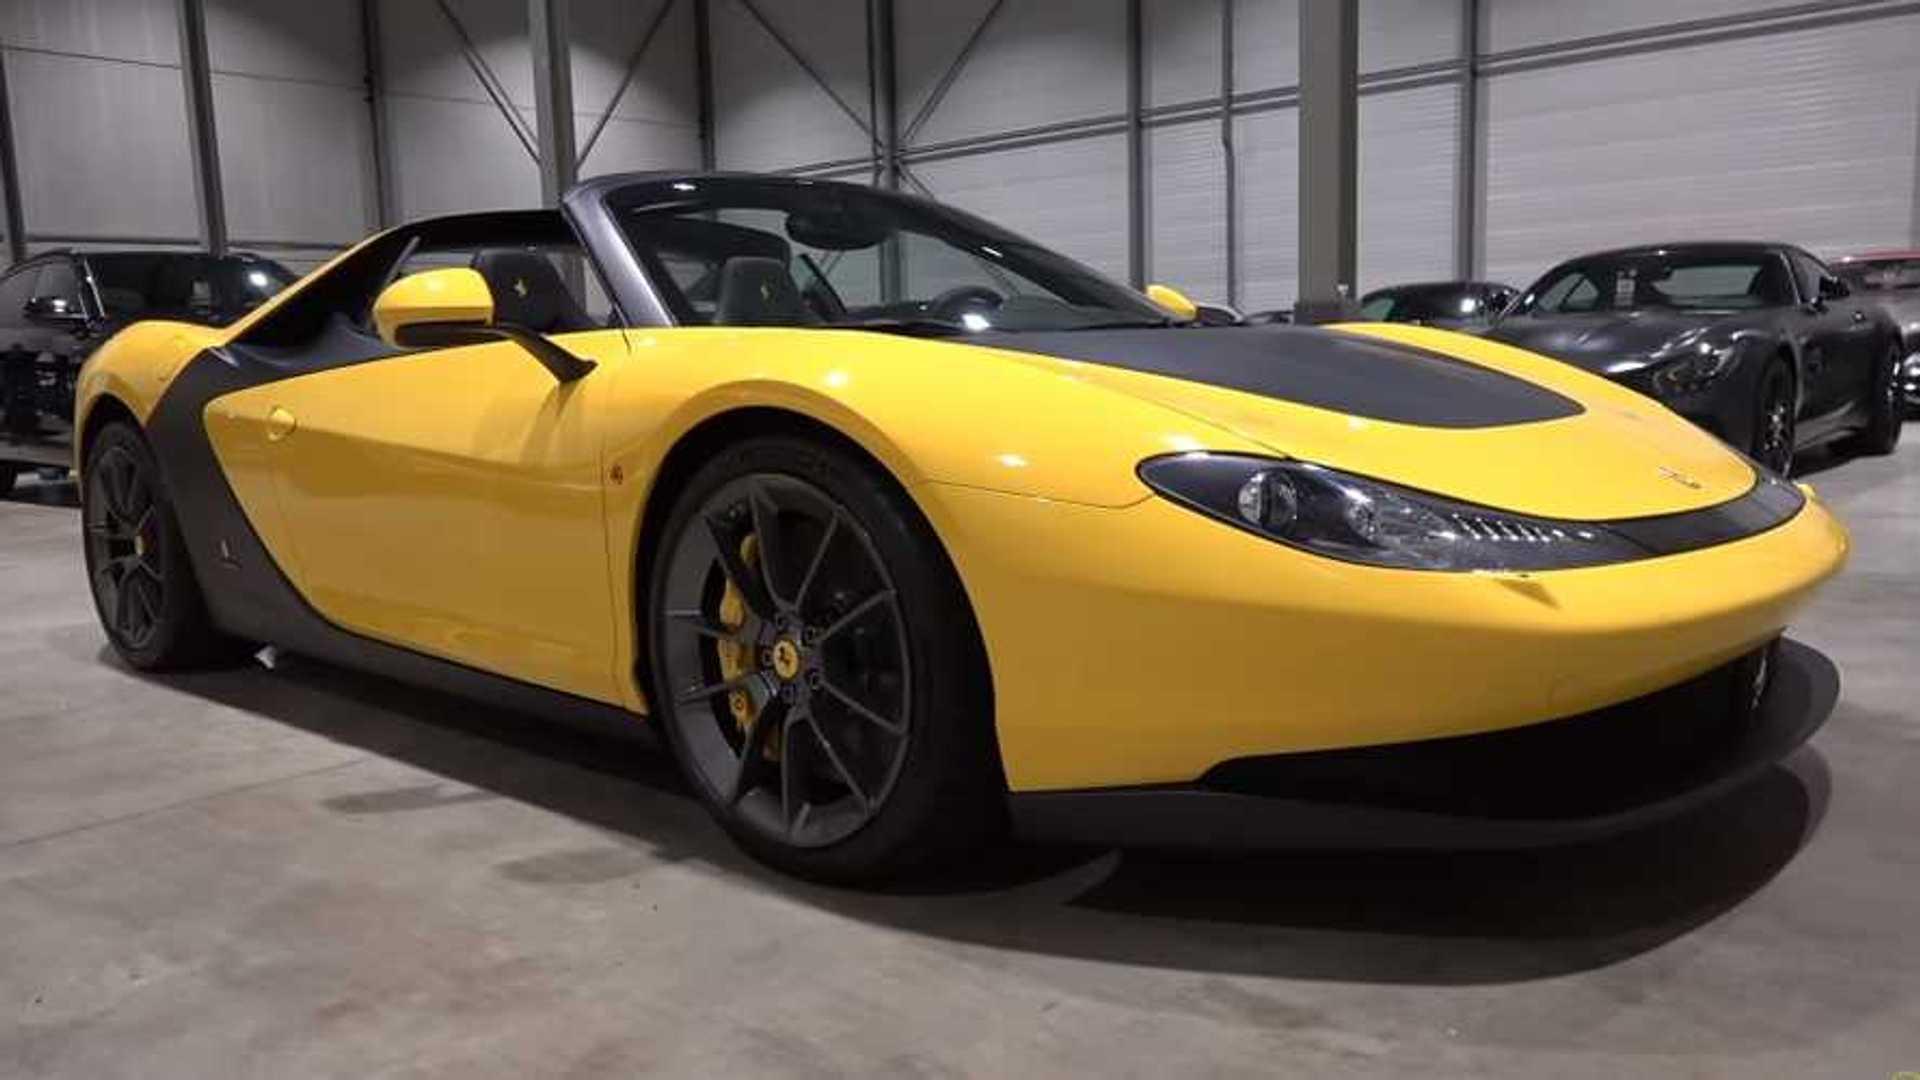 1-of-6 Ferrari Sergio oozes exclusivity on camera